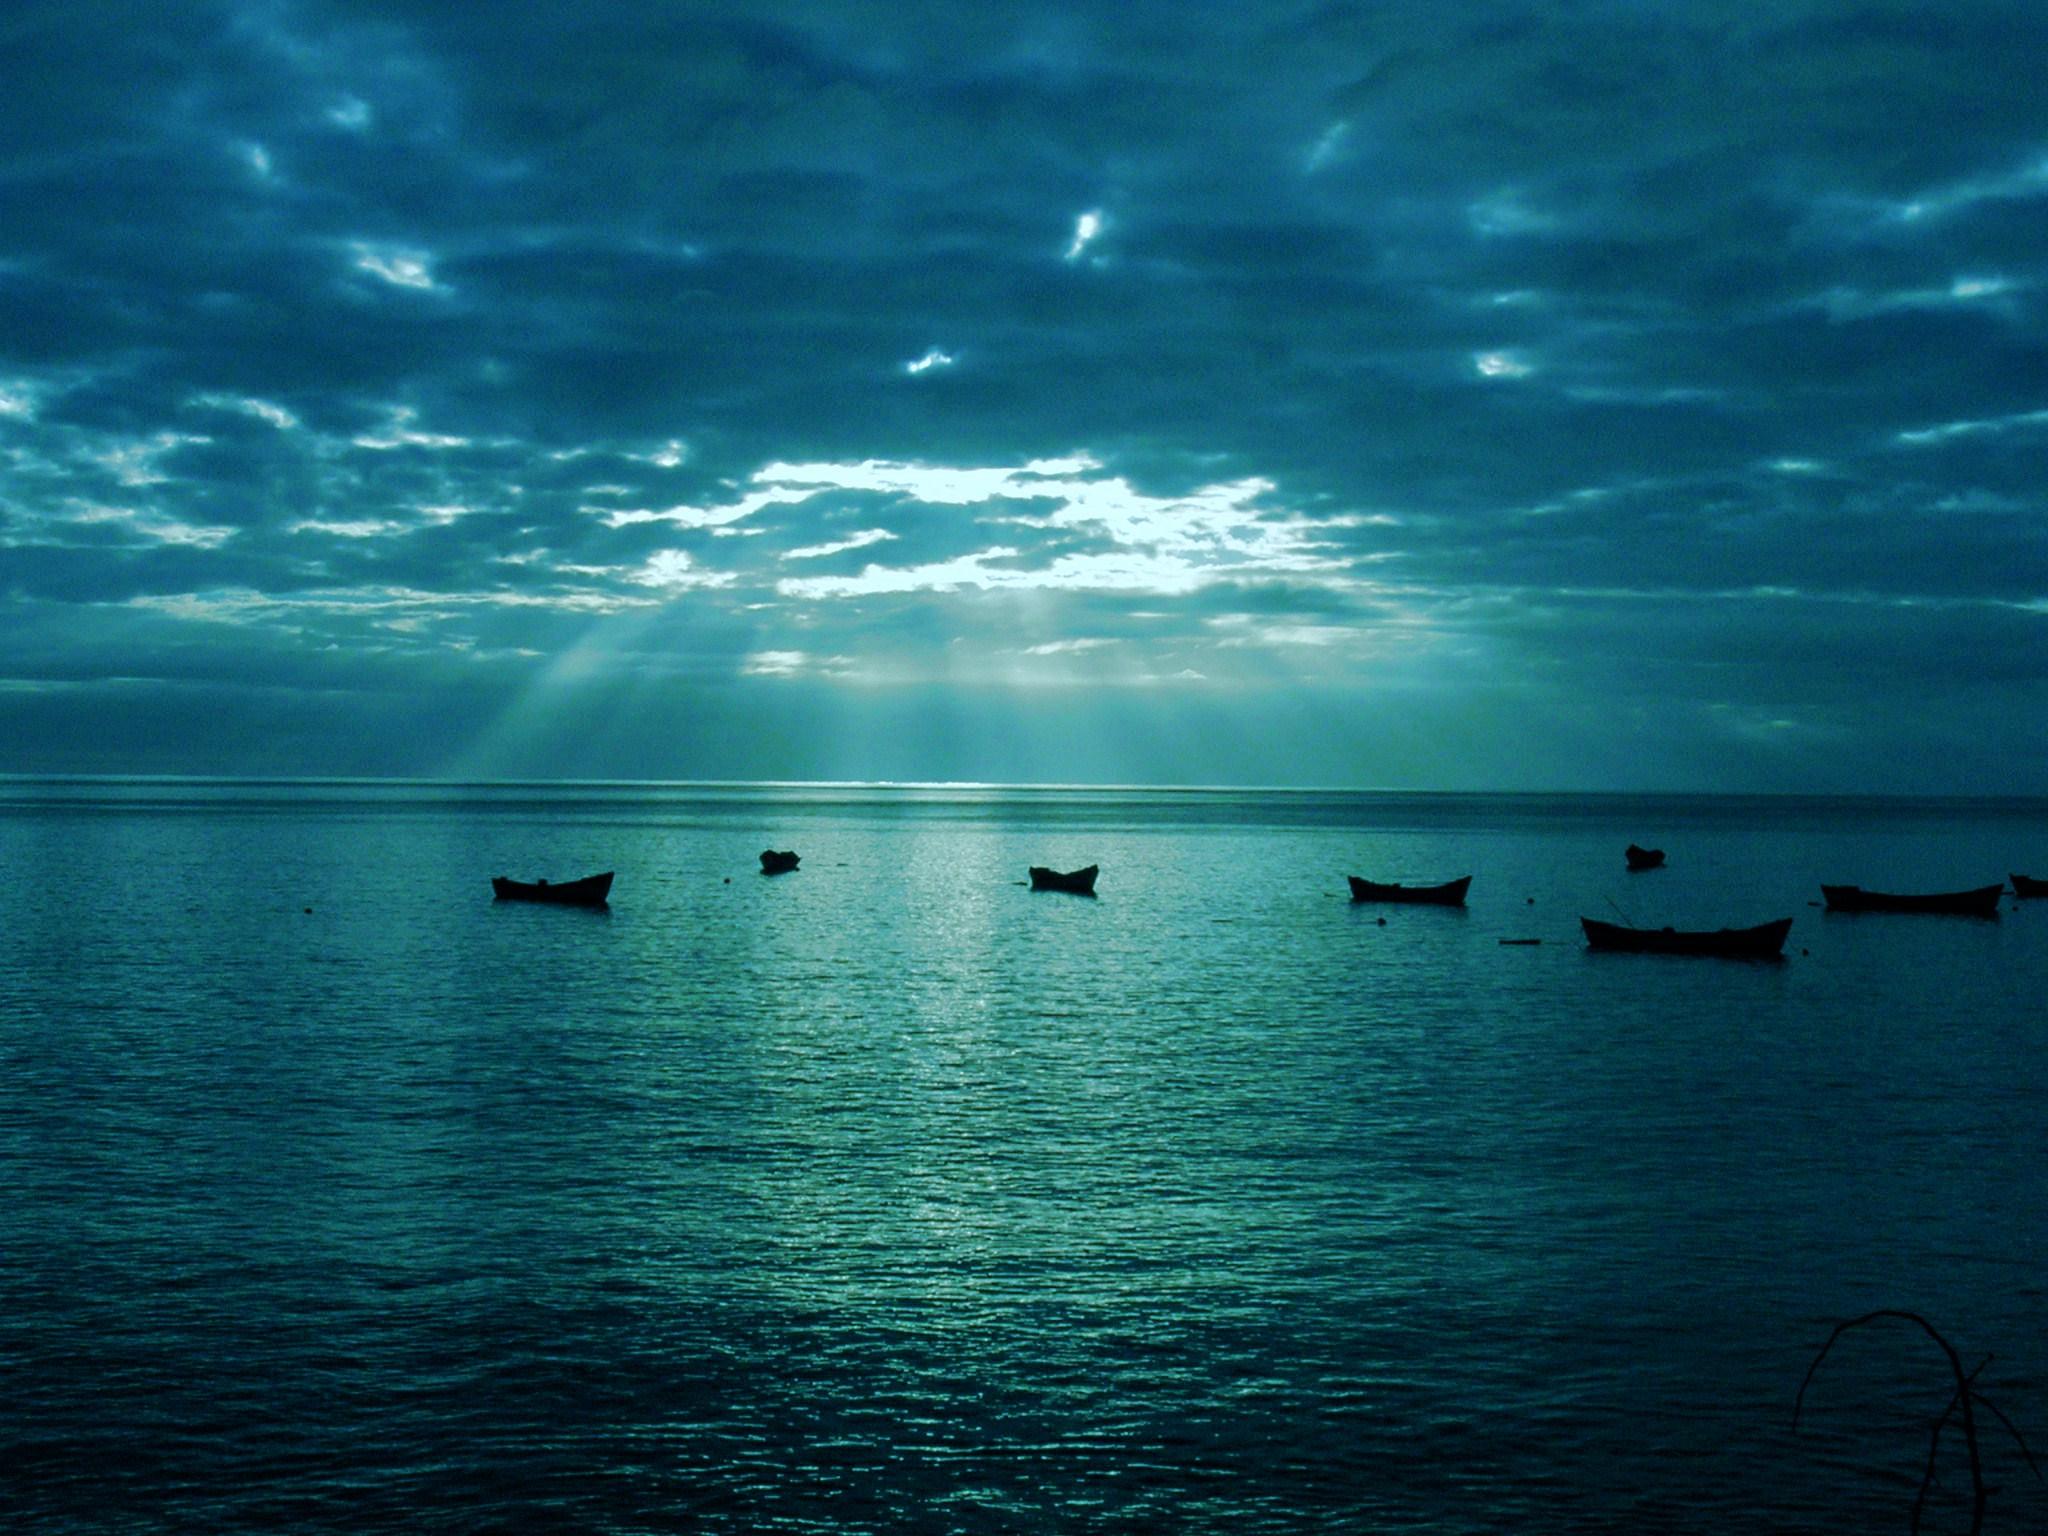 2048x1536 Blue Sea wallpaper 2048x1536